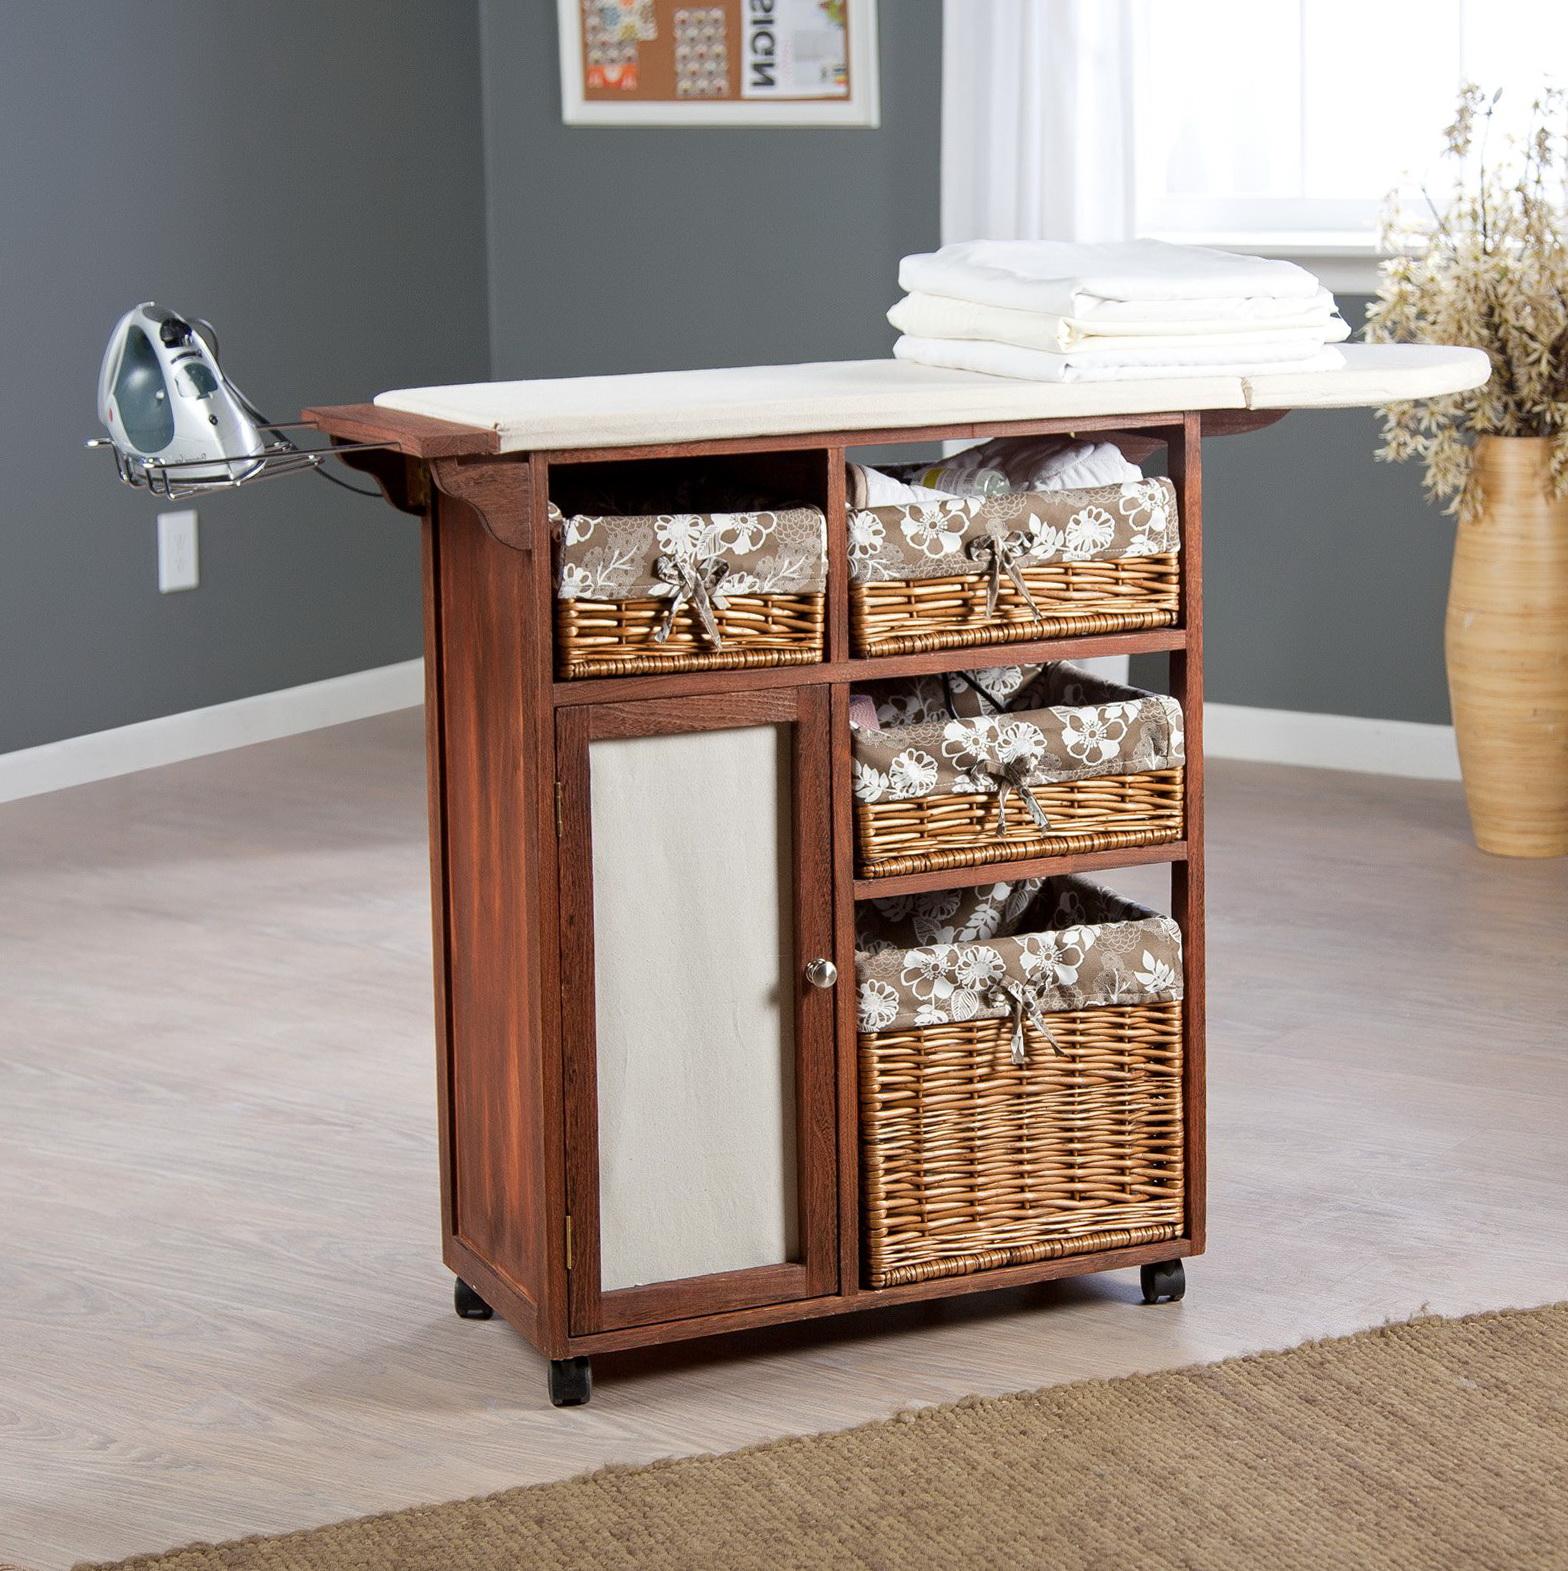 Ironing Board Cabinet On Wheels